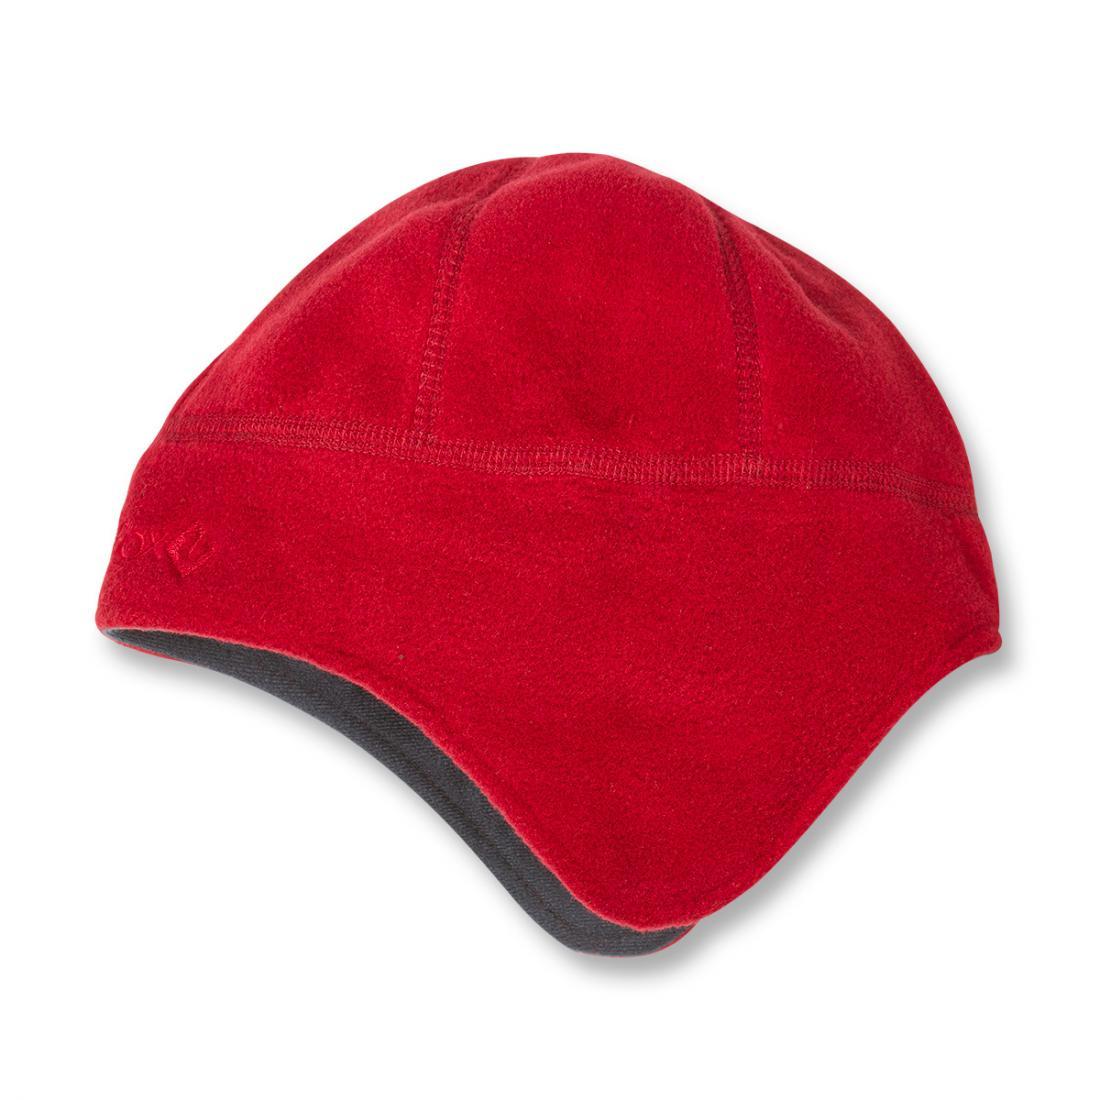 Шапка FiordШапки<br><br><br>Цвет: Красный<br>Размер: 60